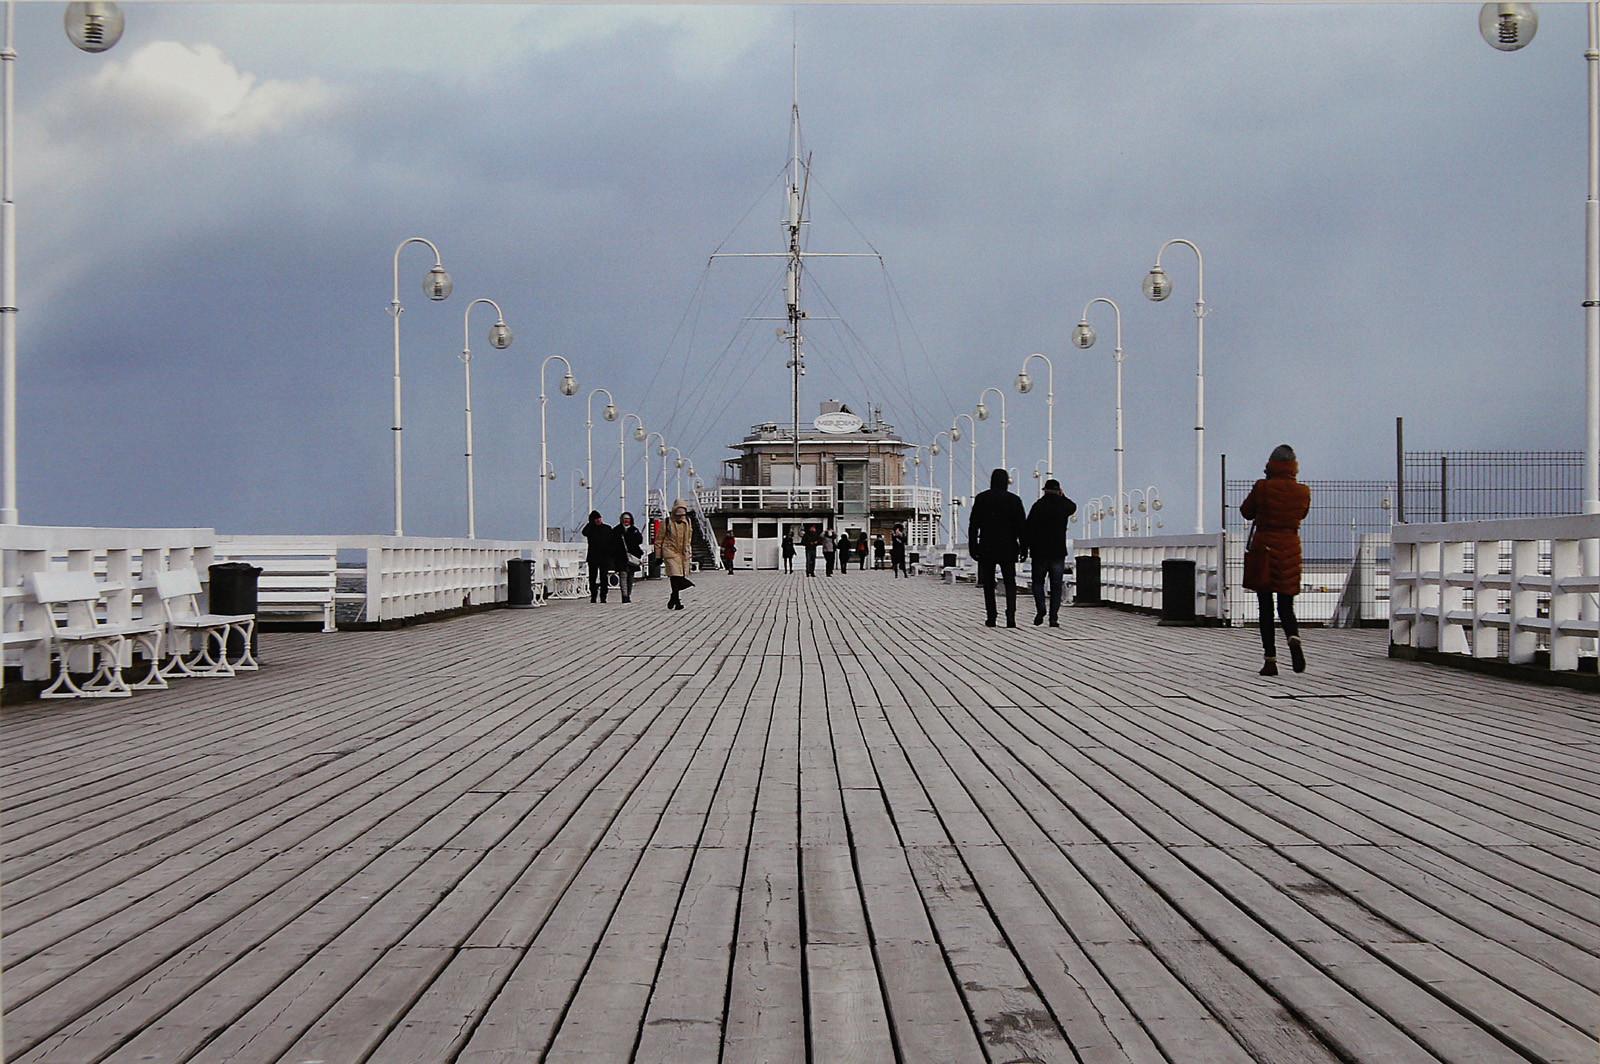 COLOUR - Pier, Sopot, Poland by Alec Barclay (8 marks)